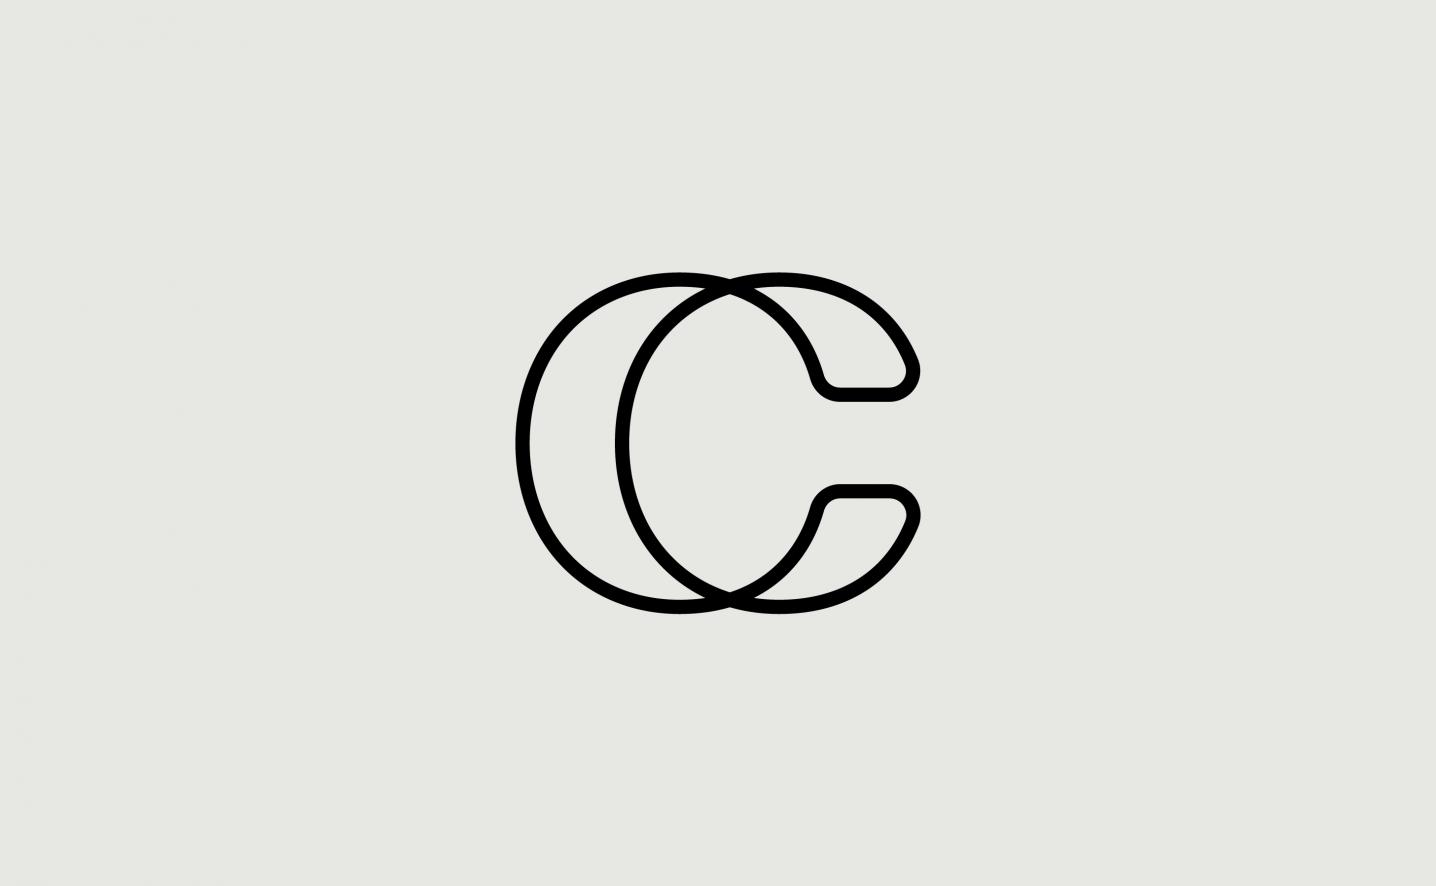 logo-design-crix-capital-london